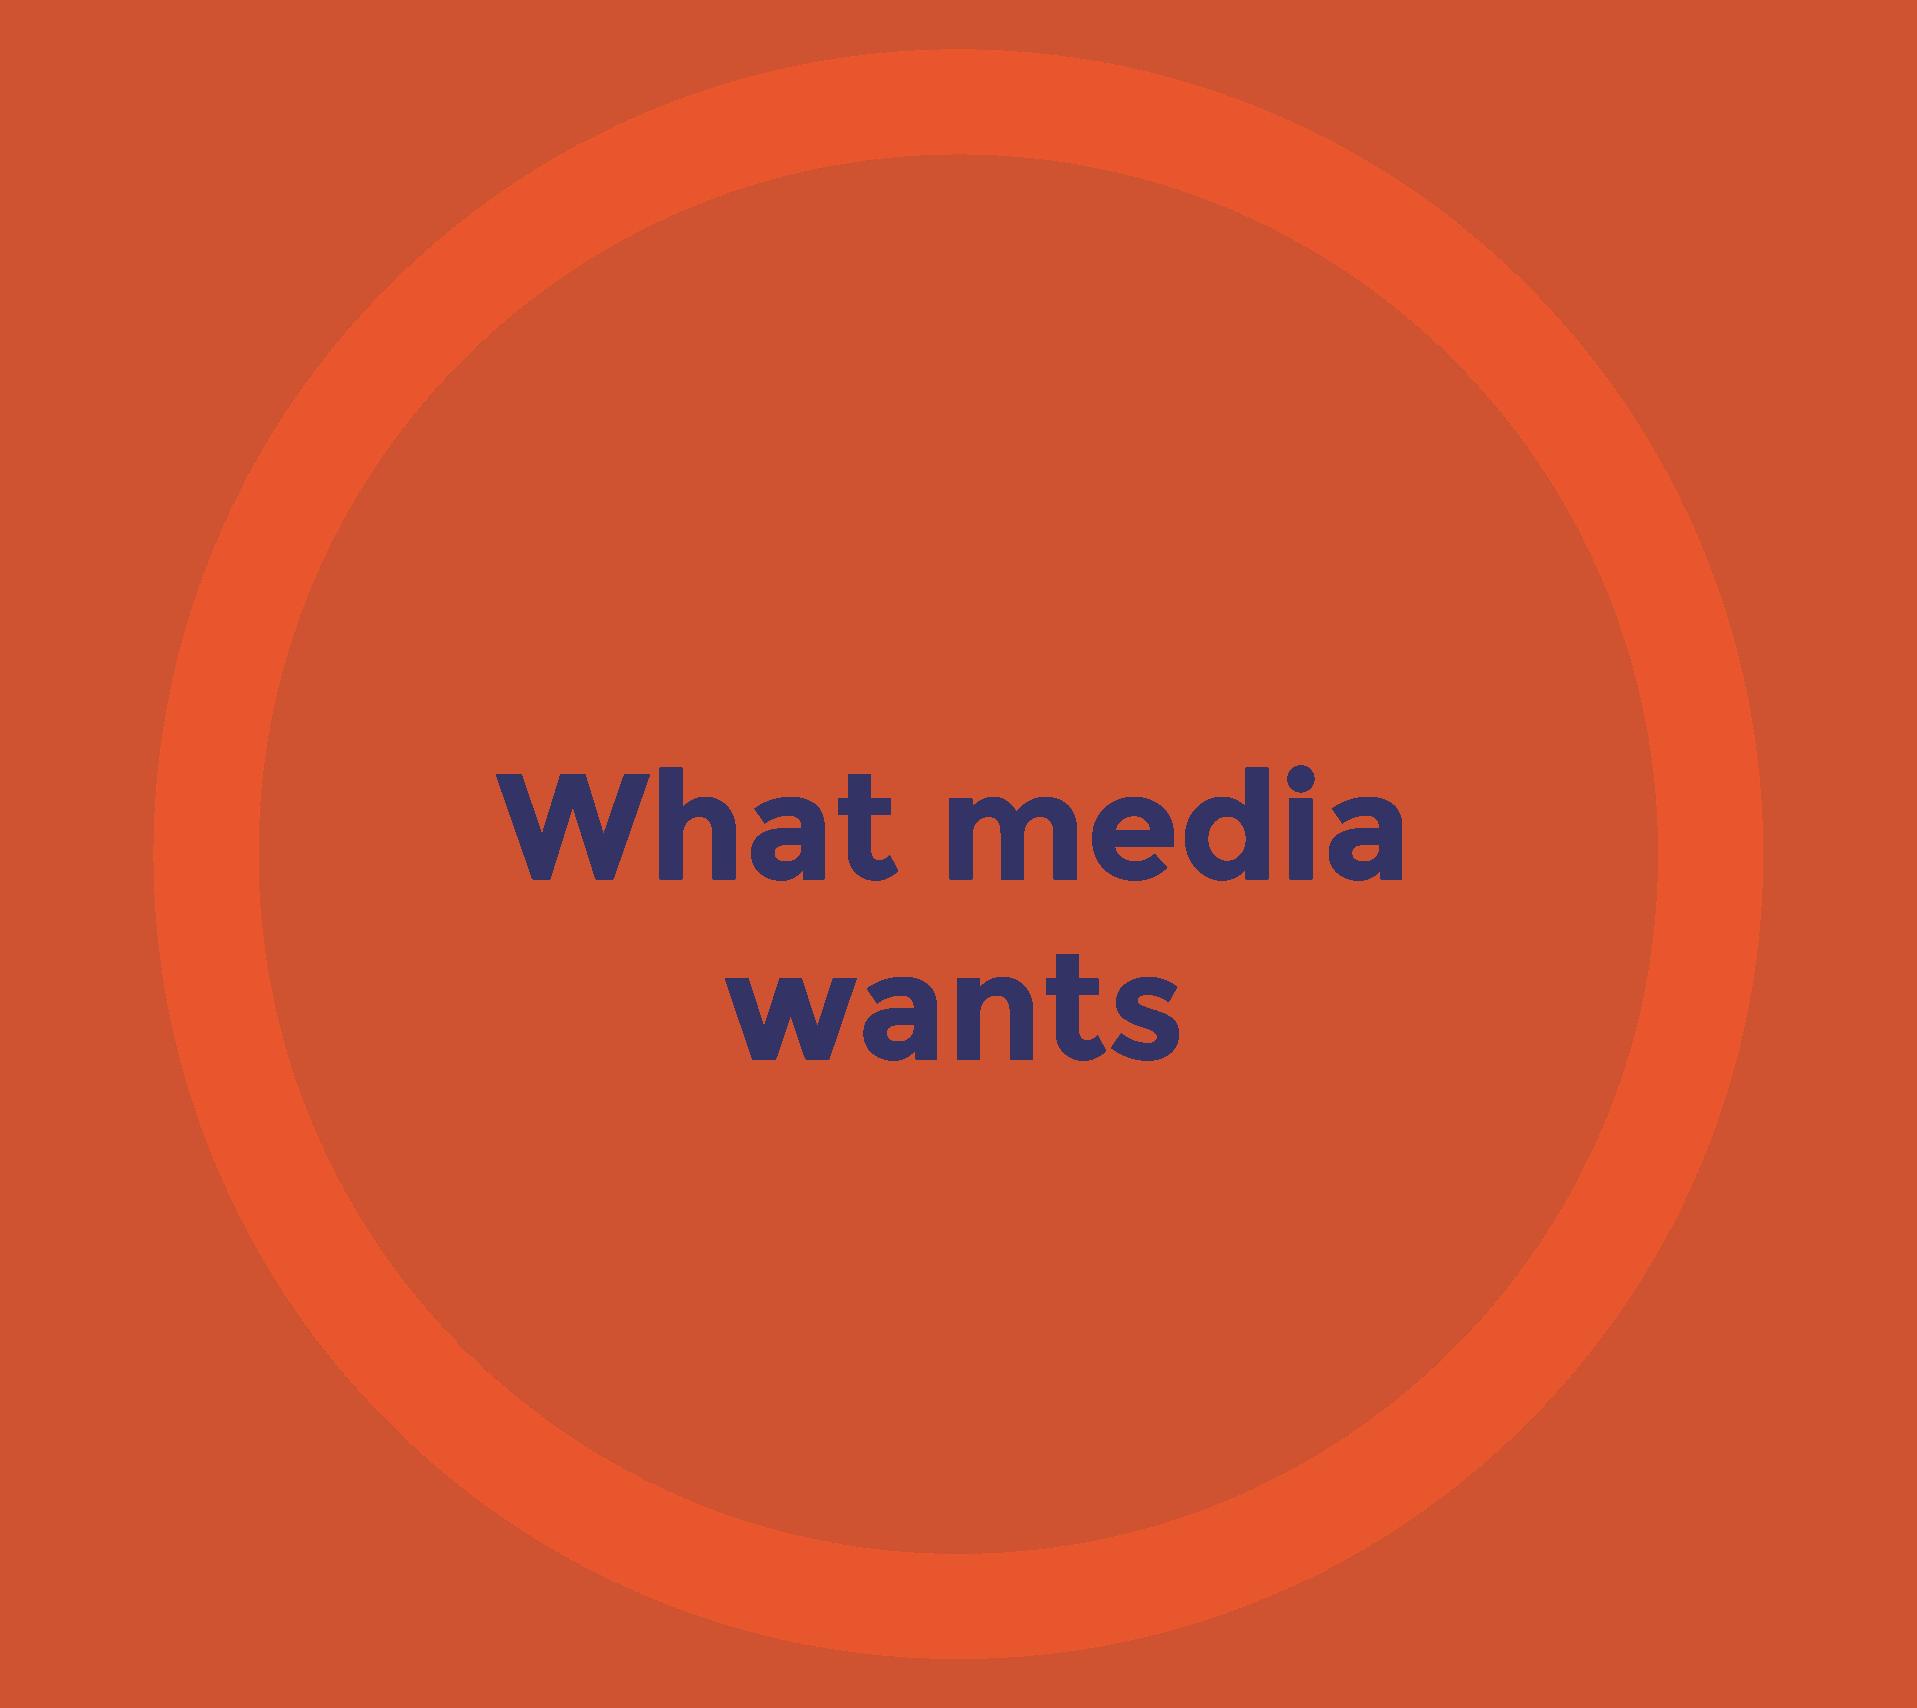 agenda-mediasavvy-01